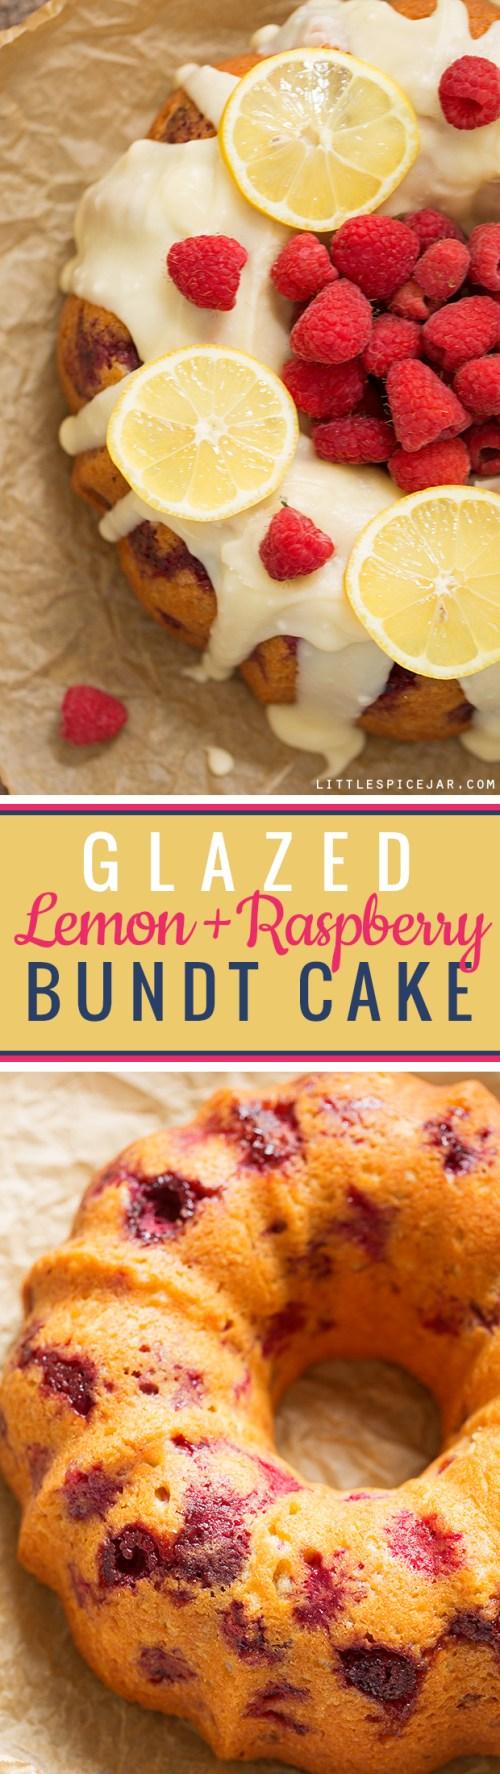 Glazed-Lemon-Raspberry-Bundt-Cake-9